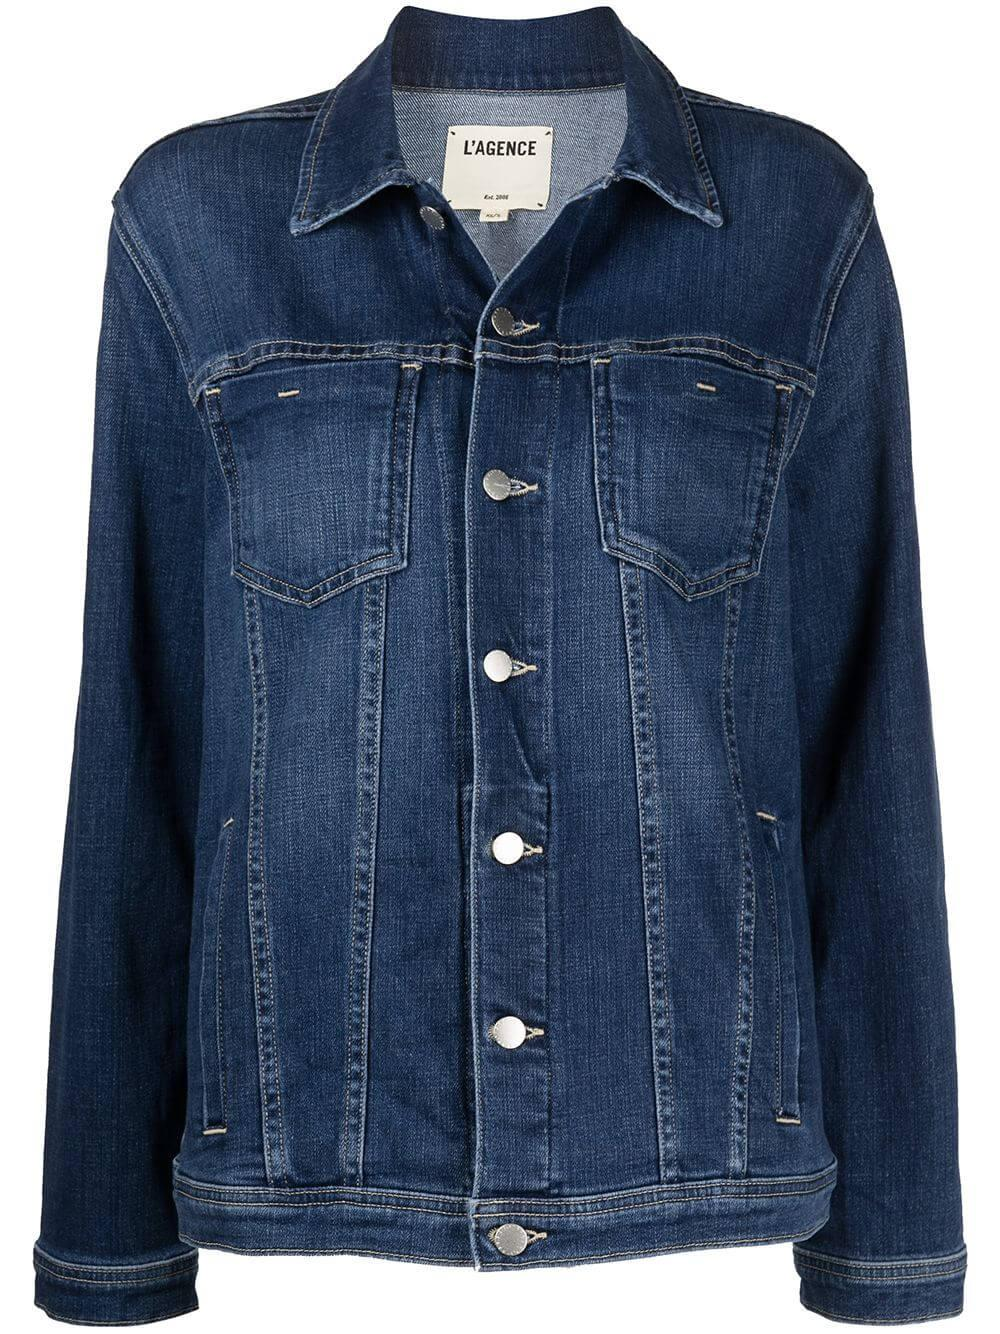 Karina Oversized Denim Jacket Item # 1403RDM